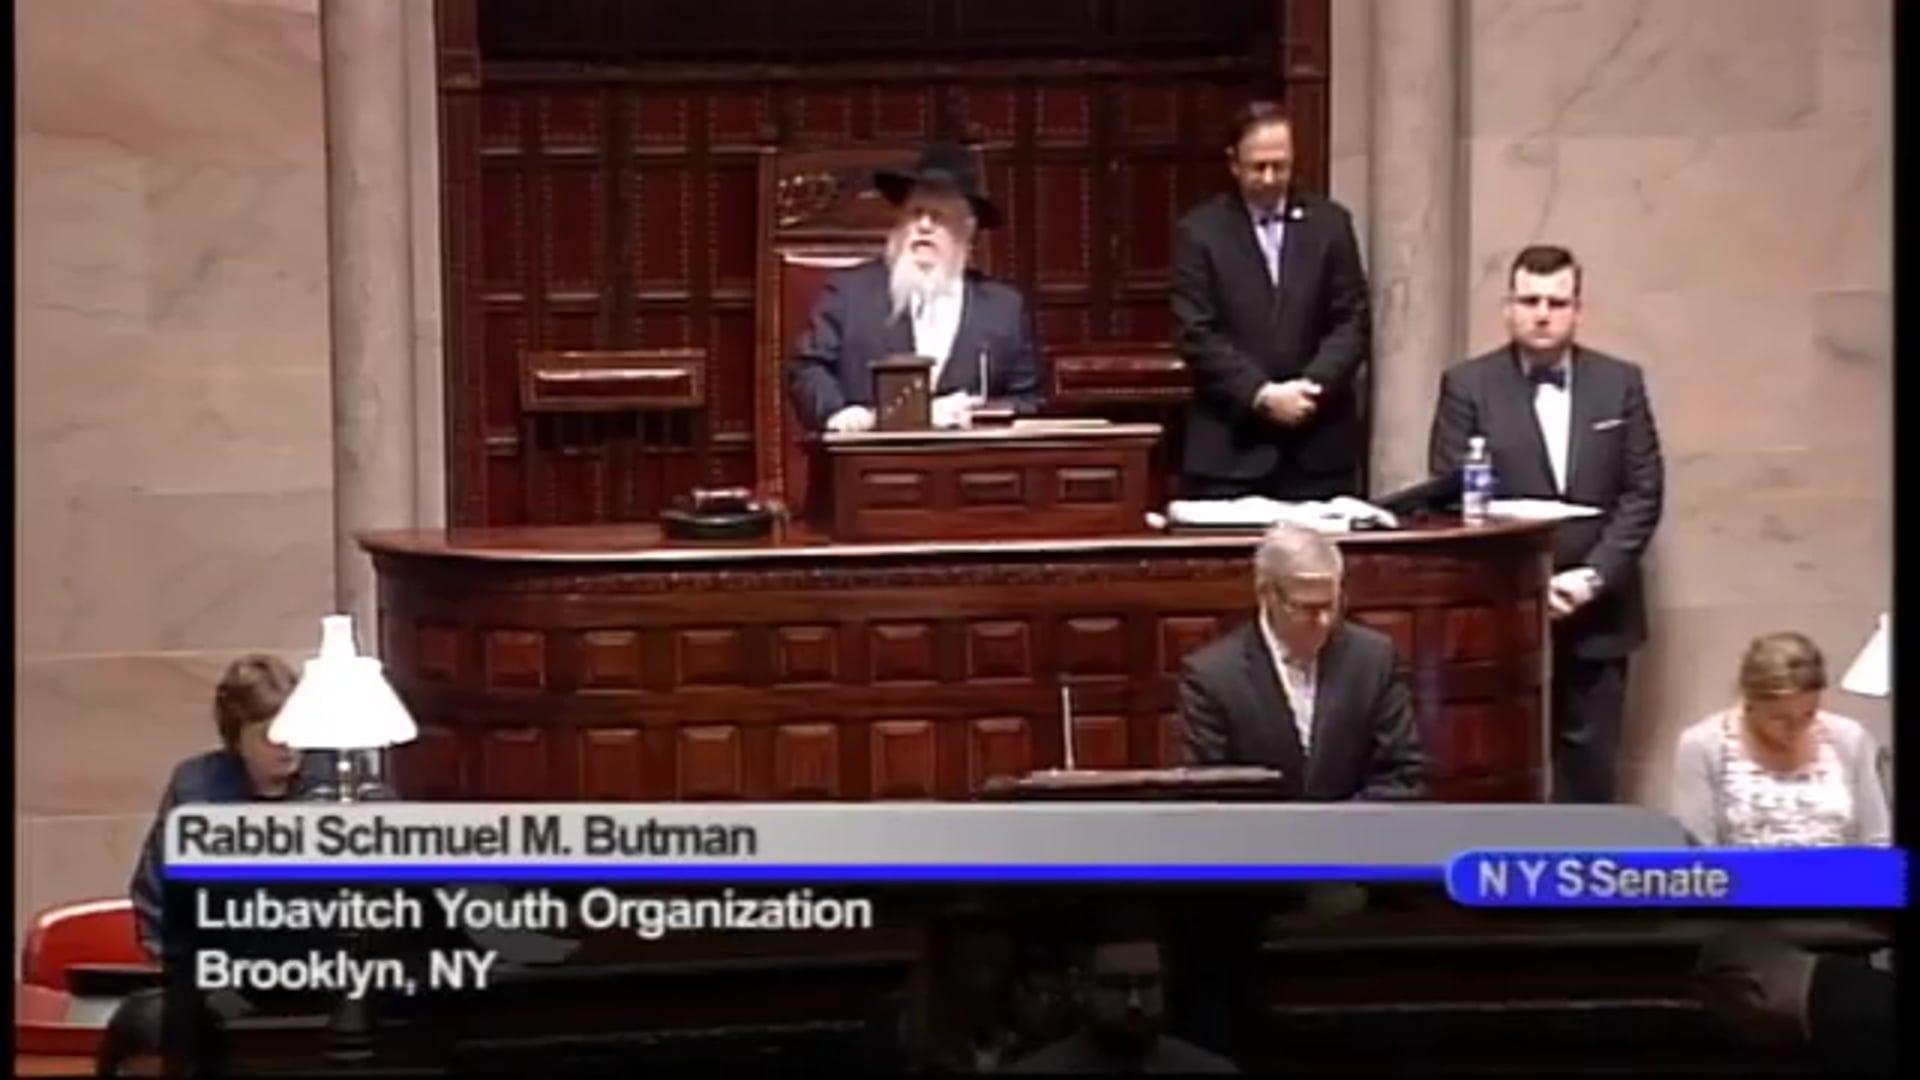 April 3, 2017 - NYS Senate Invocation by Rabbi Schmuel M. Butman